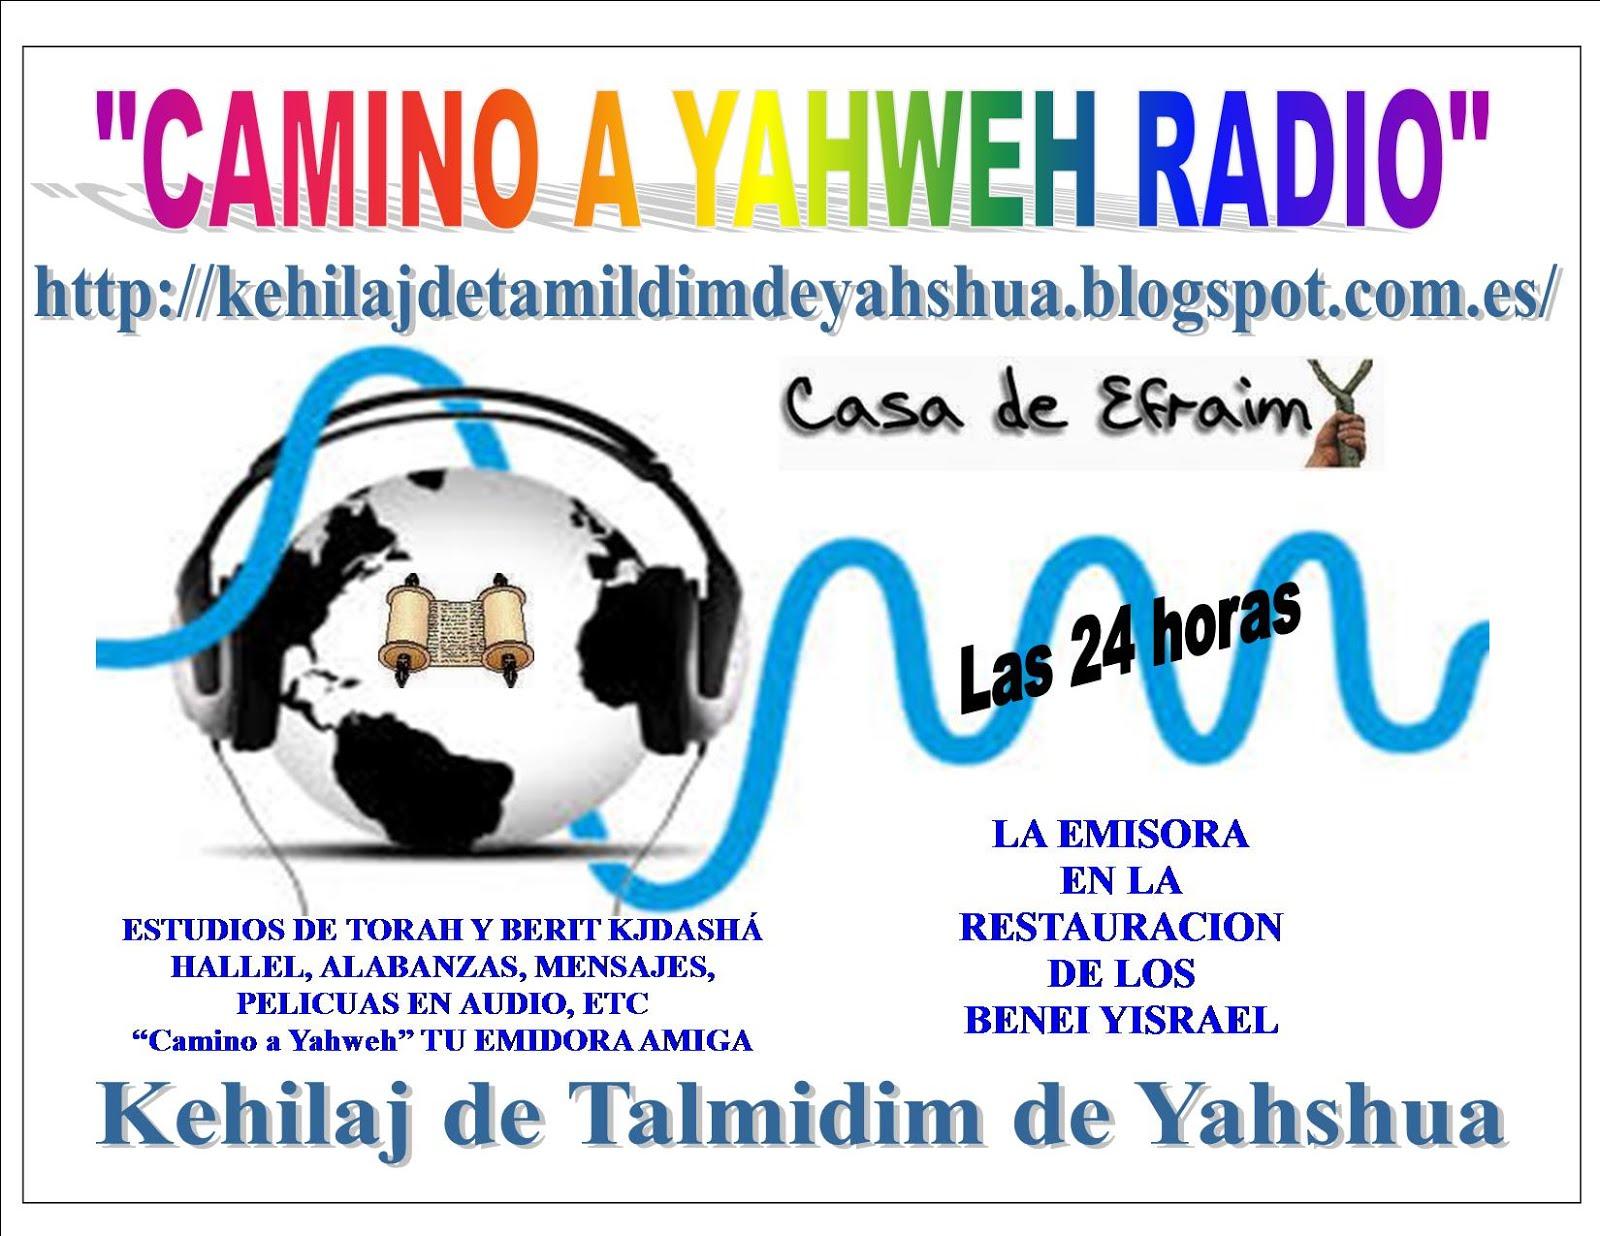 EMISORA DE RADIO 24 HORAS